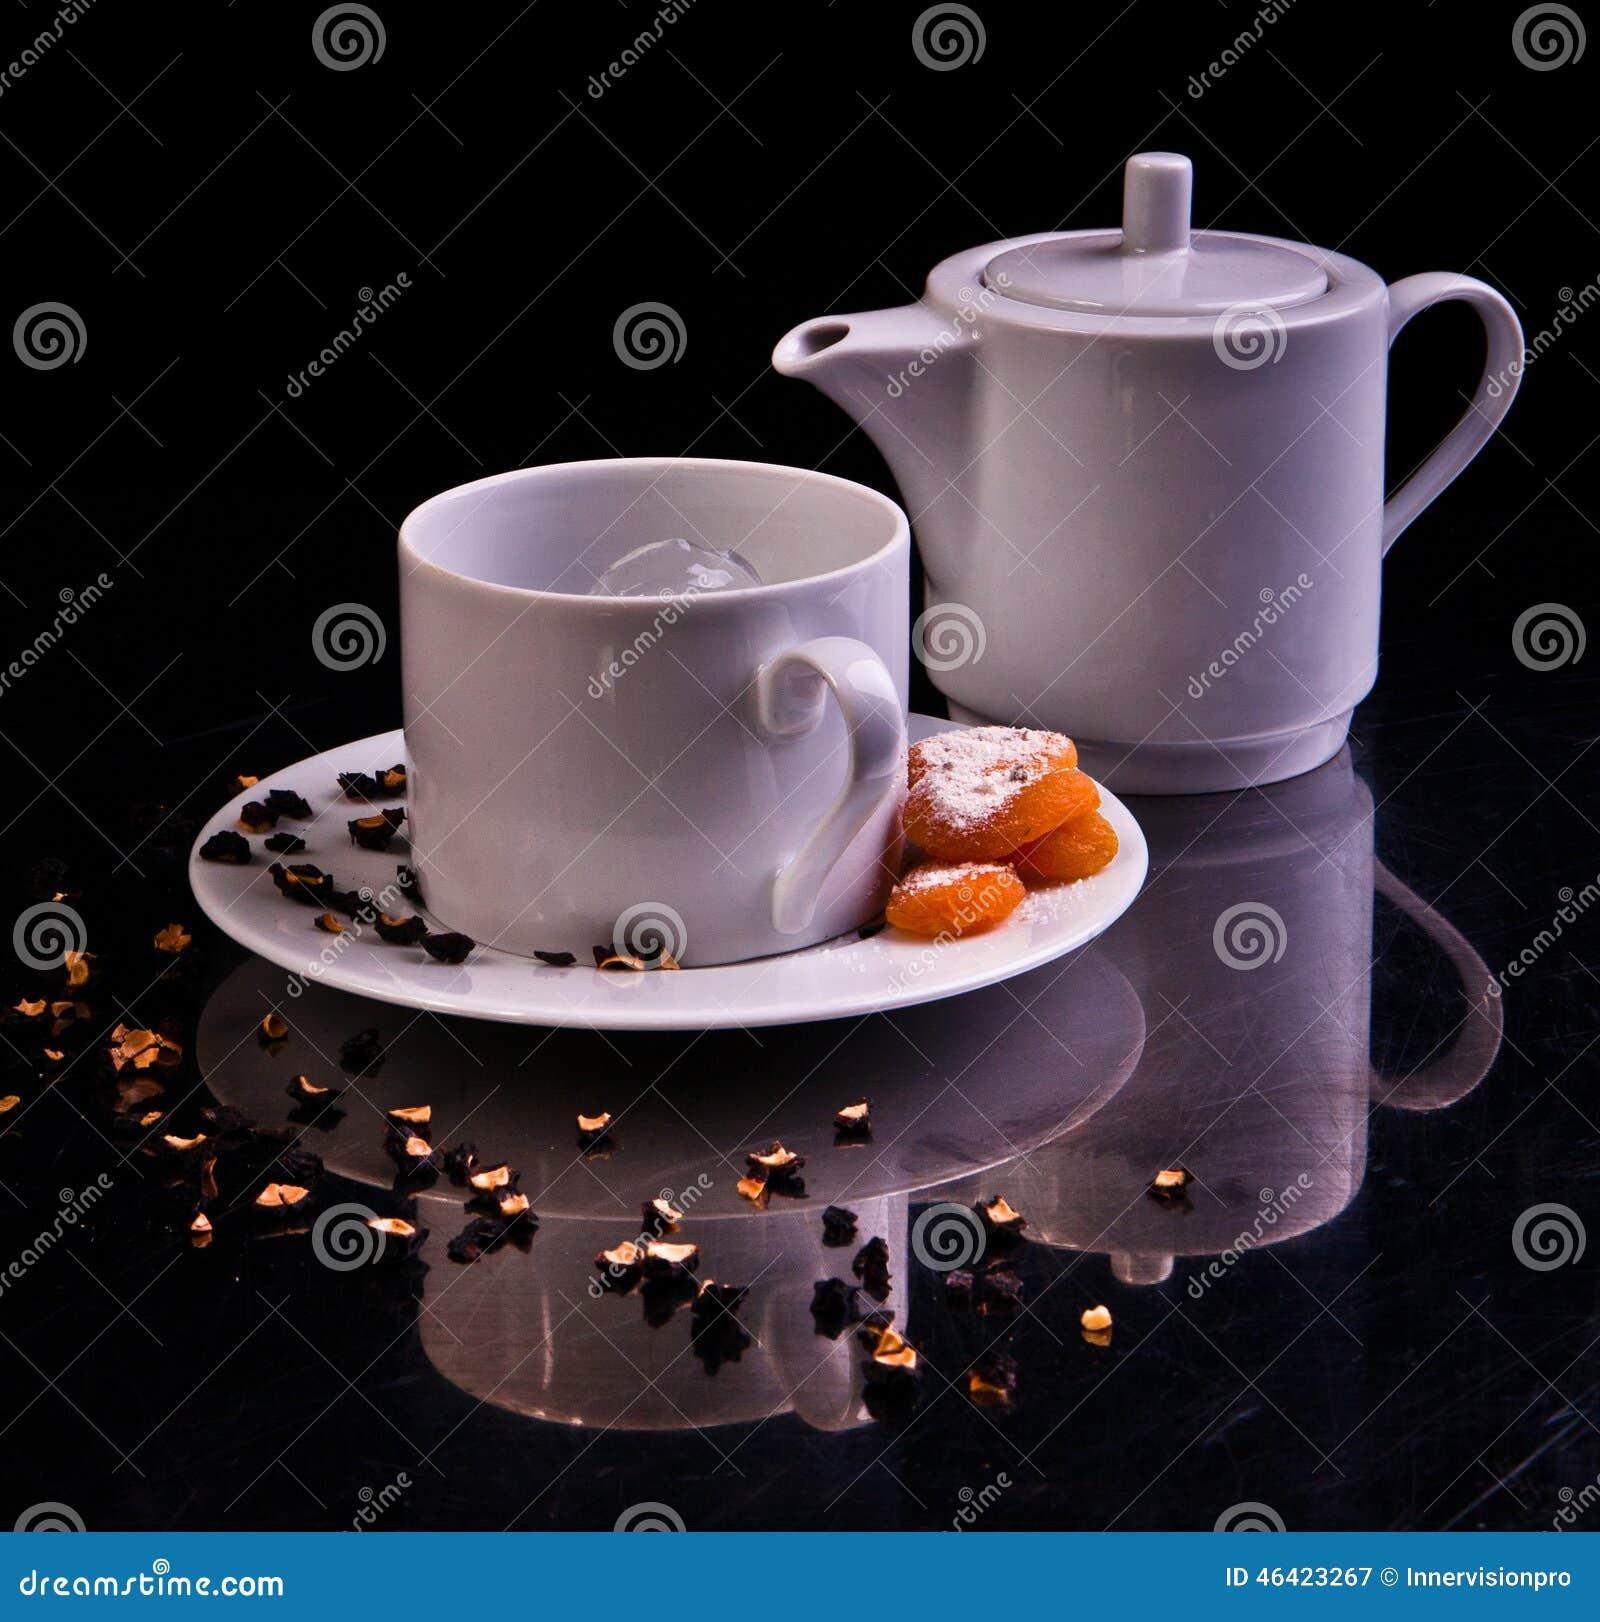 Fruity Cool Tea Stock Photo Image 46423267